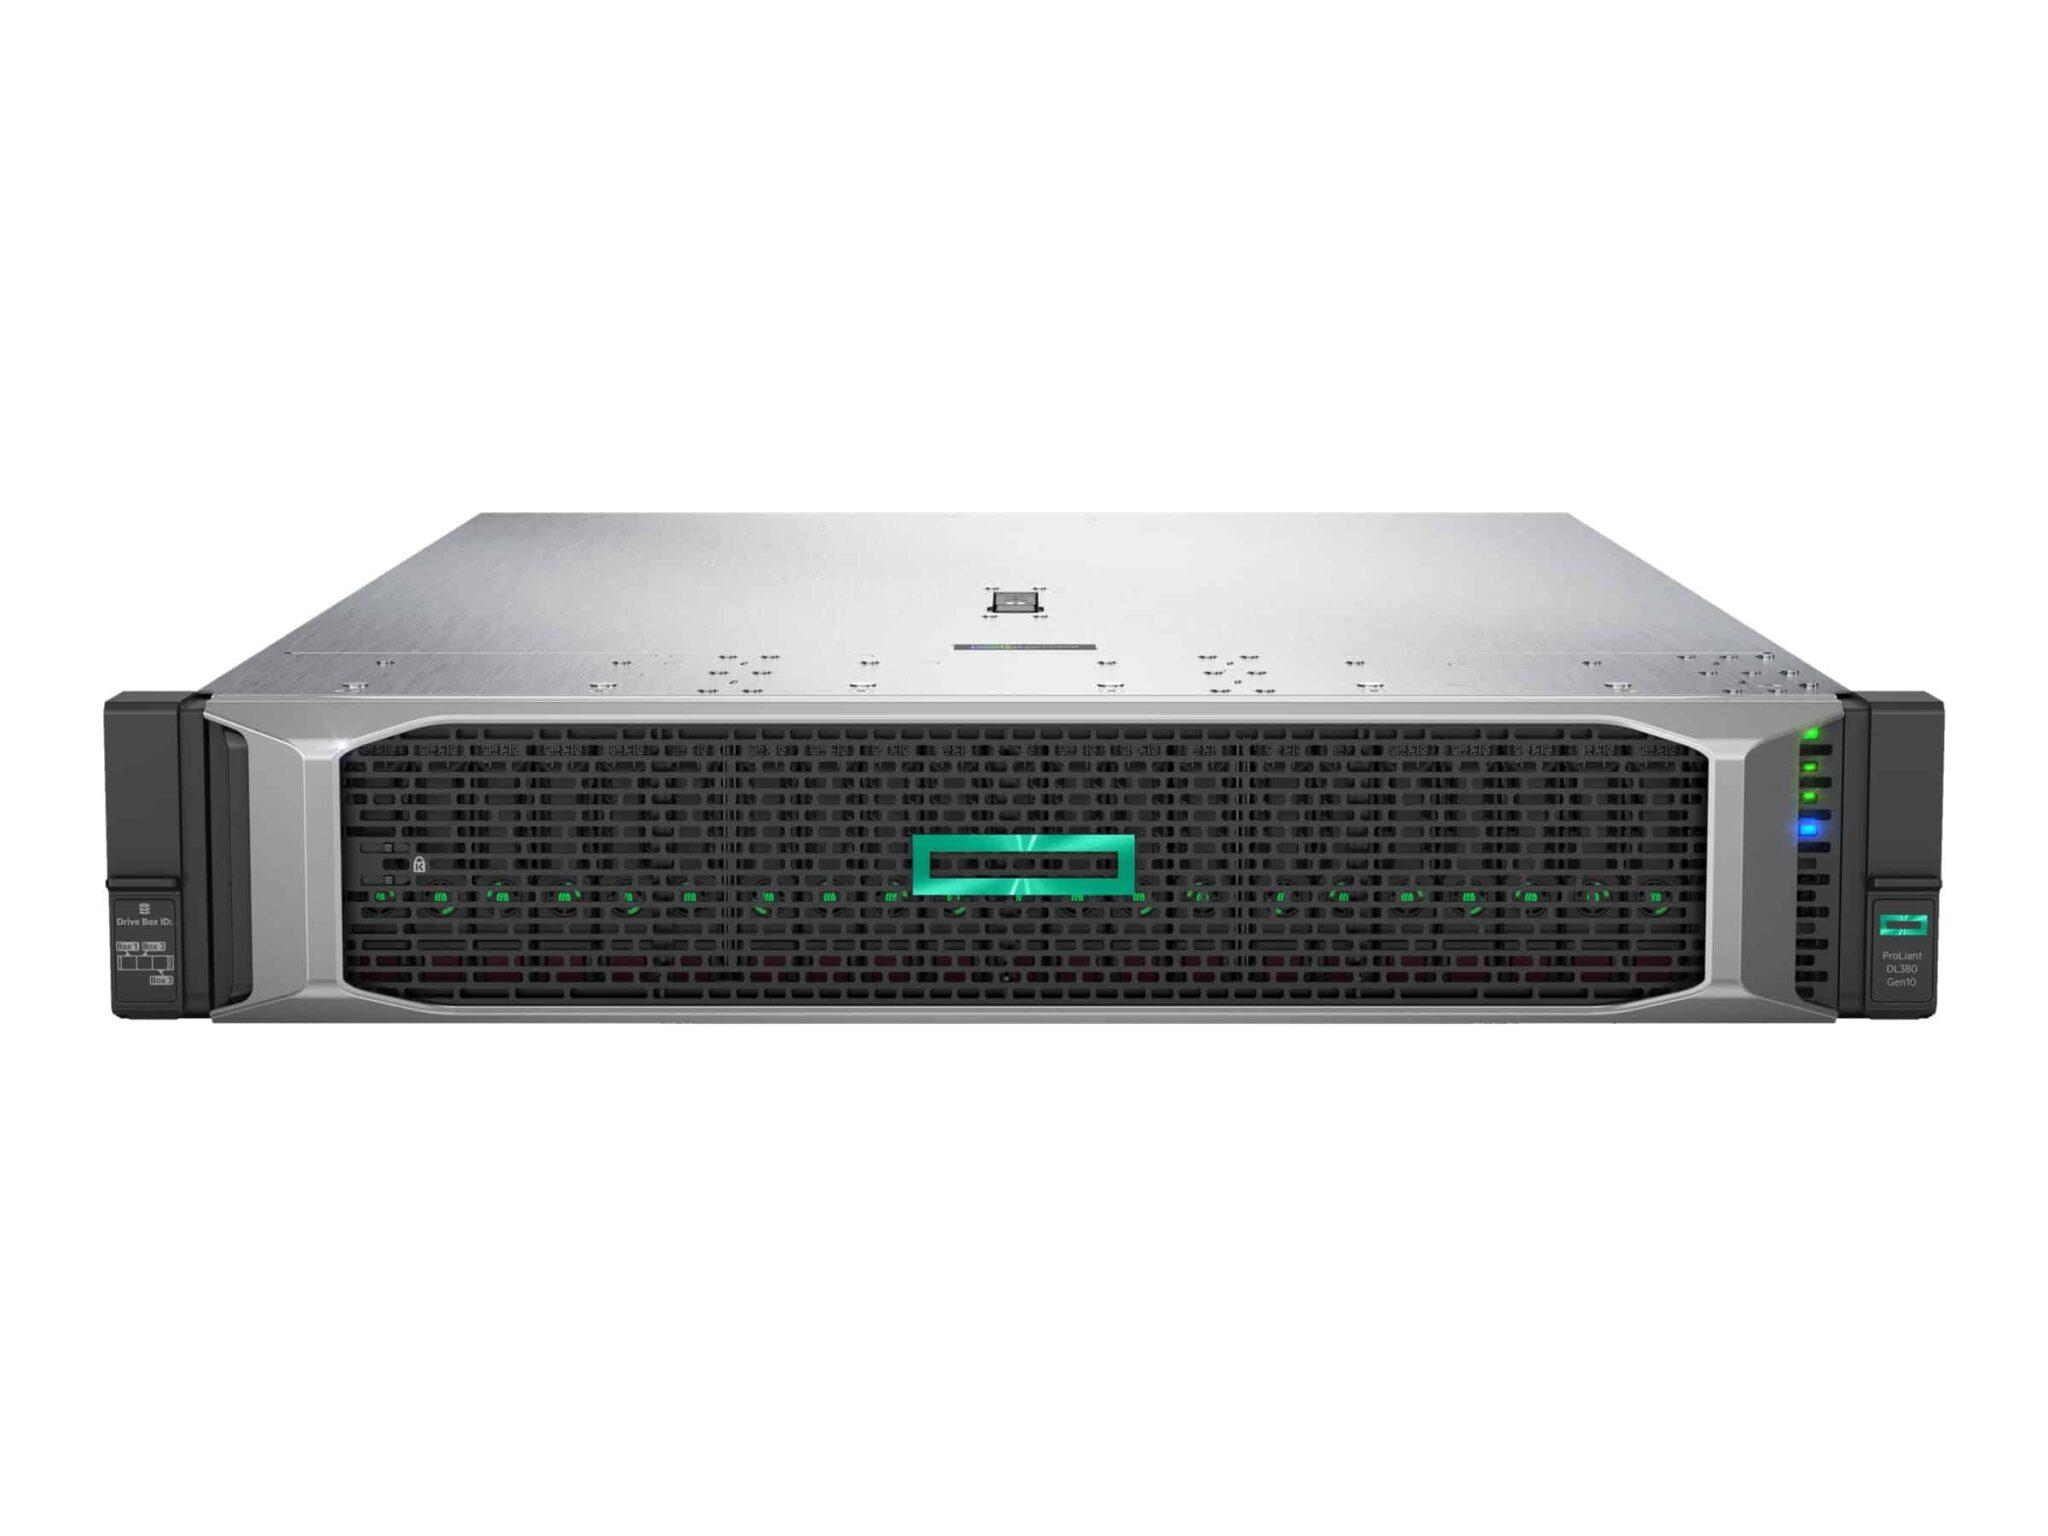 HPE-ProLiant-DL380-Gen10-Rack-mountable-Server-2U-1-Xeon-Bronze-3106-RAM-16-GB